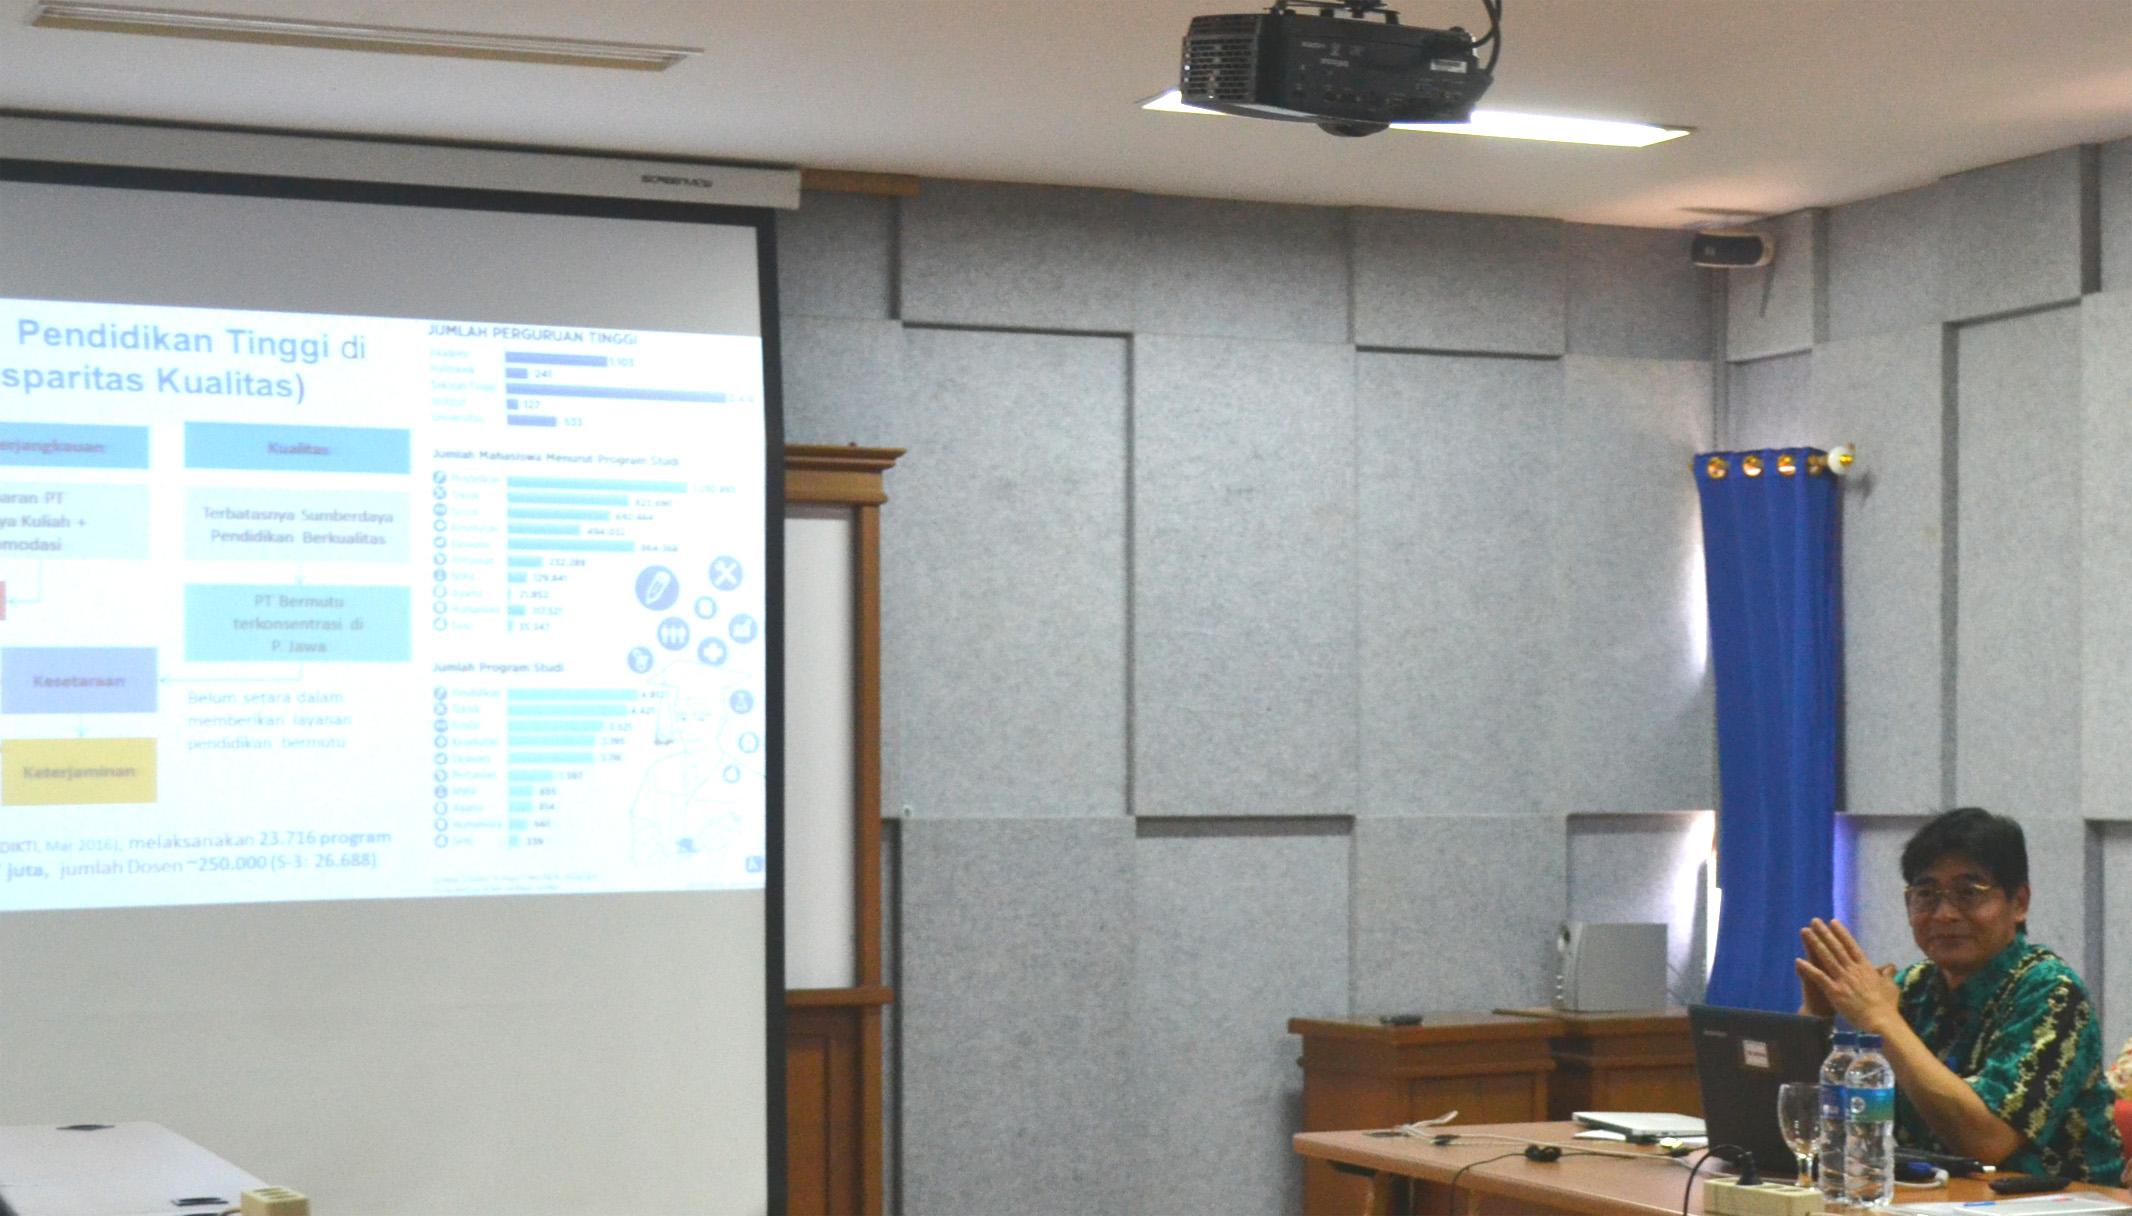 Sharing Session Prof. Intan Ahmad, PhD (Dirjen Pembelajaran dan Kemahasiswaan KEMENRISTEK DIKTI) bersama Dosen-dosen IT Del